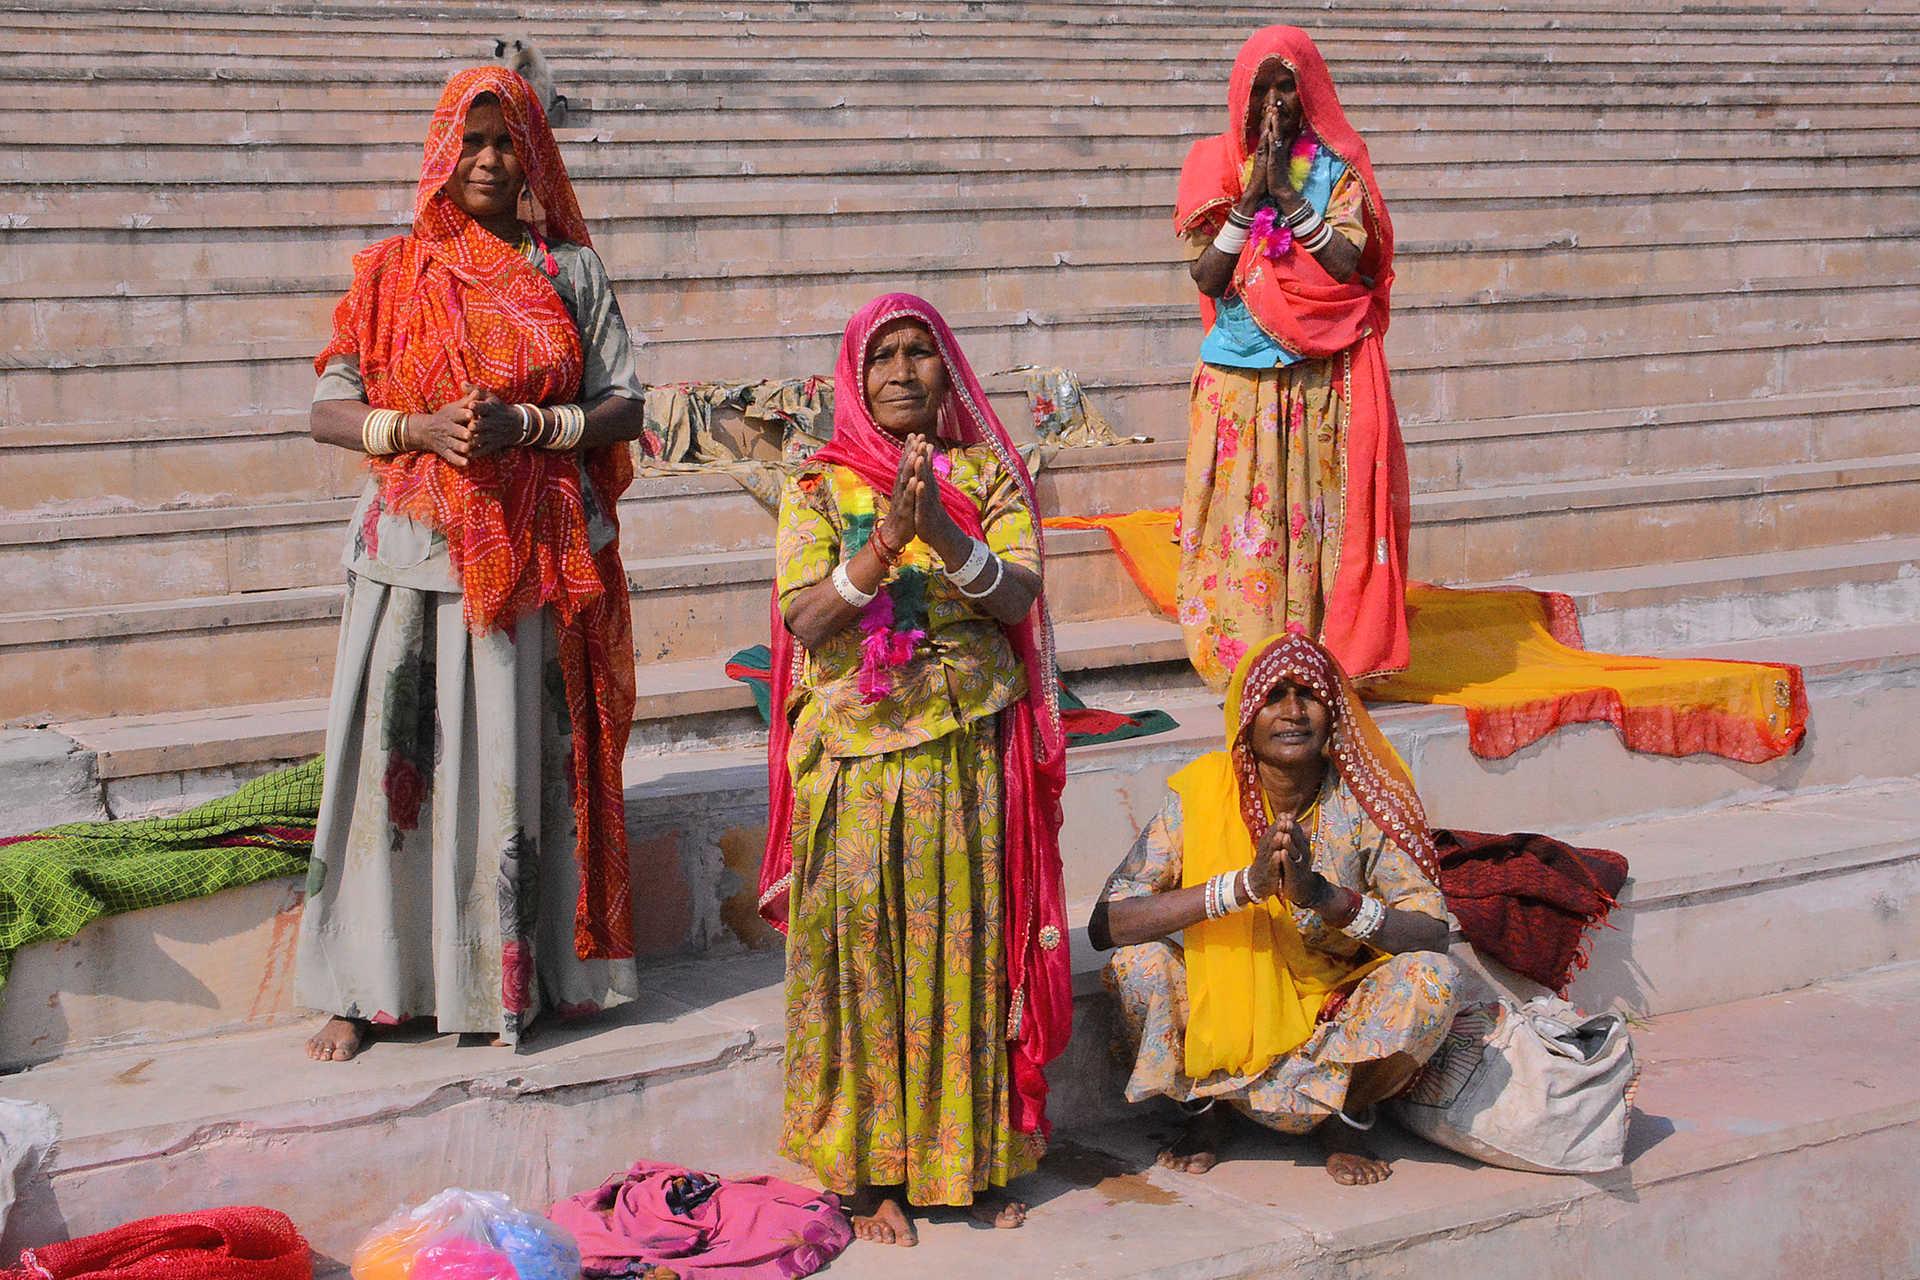 Femmes indiennes en saris sur les marches menant au Gange, Varanasi, Inde